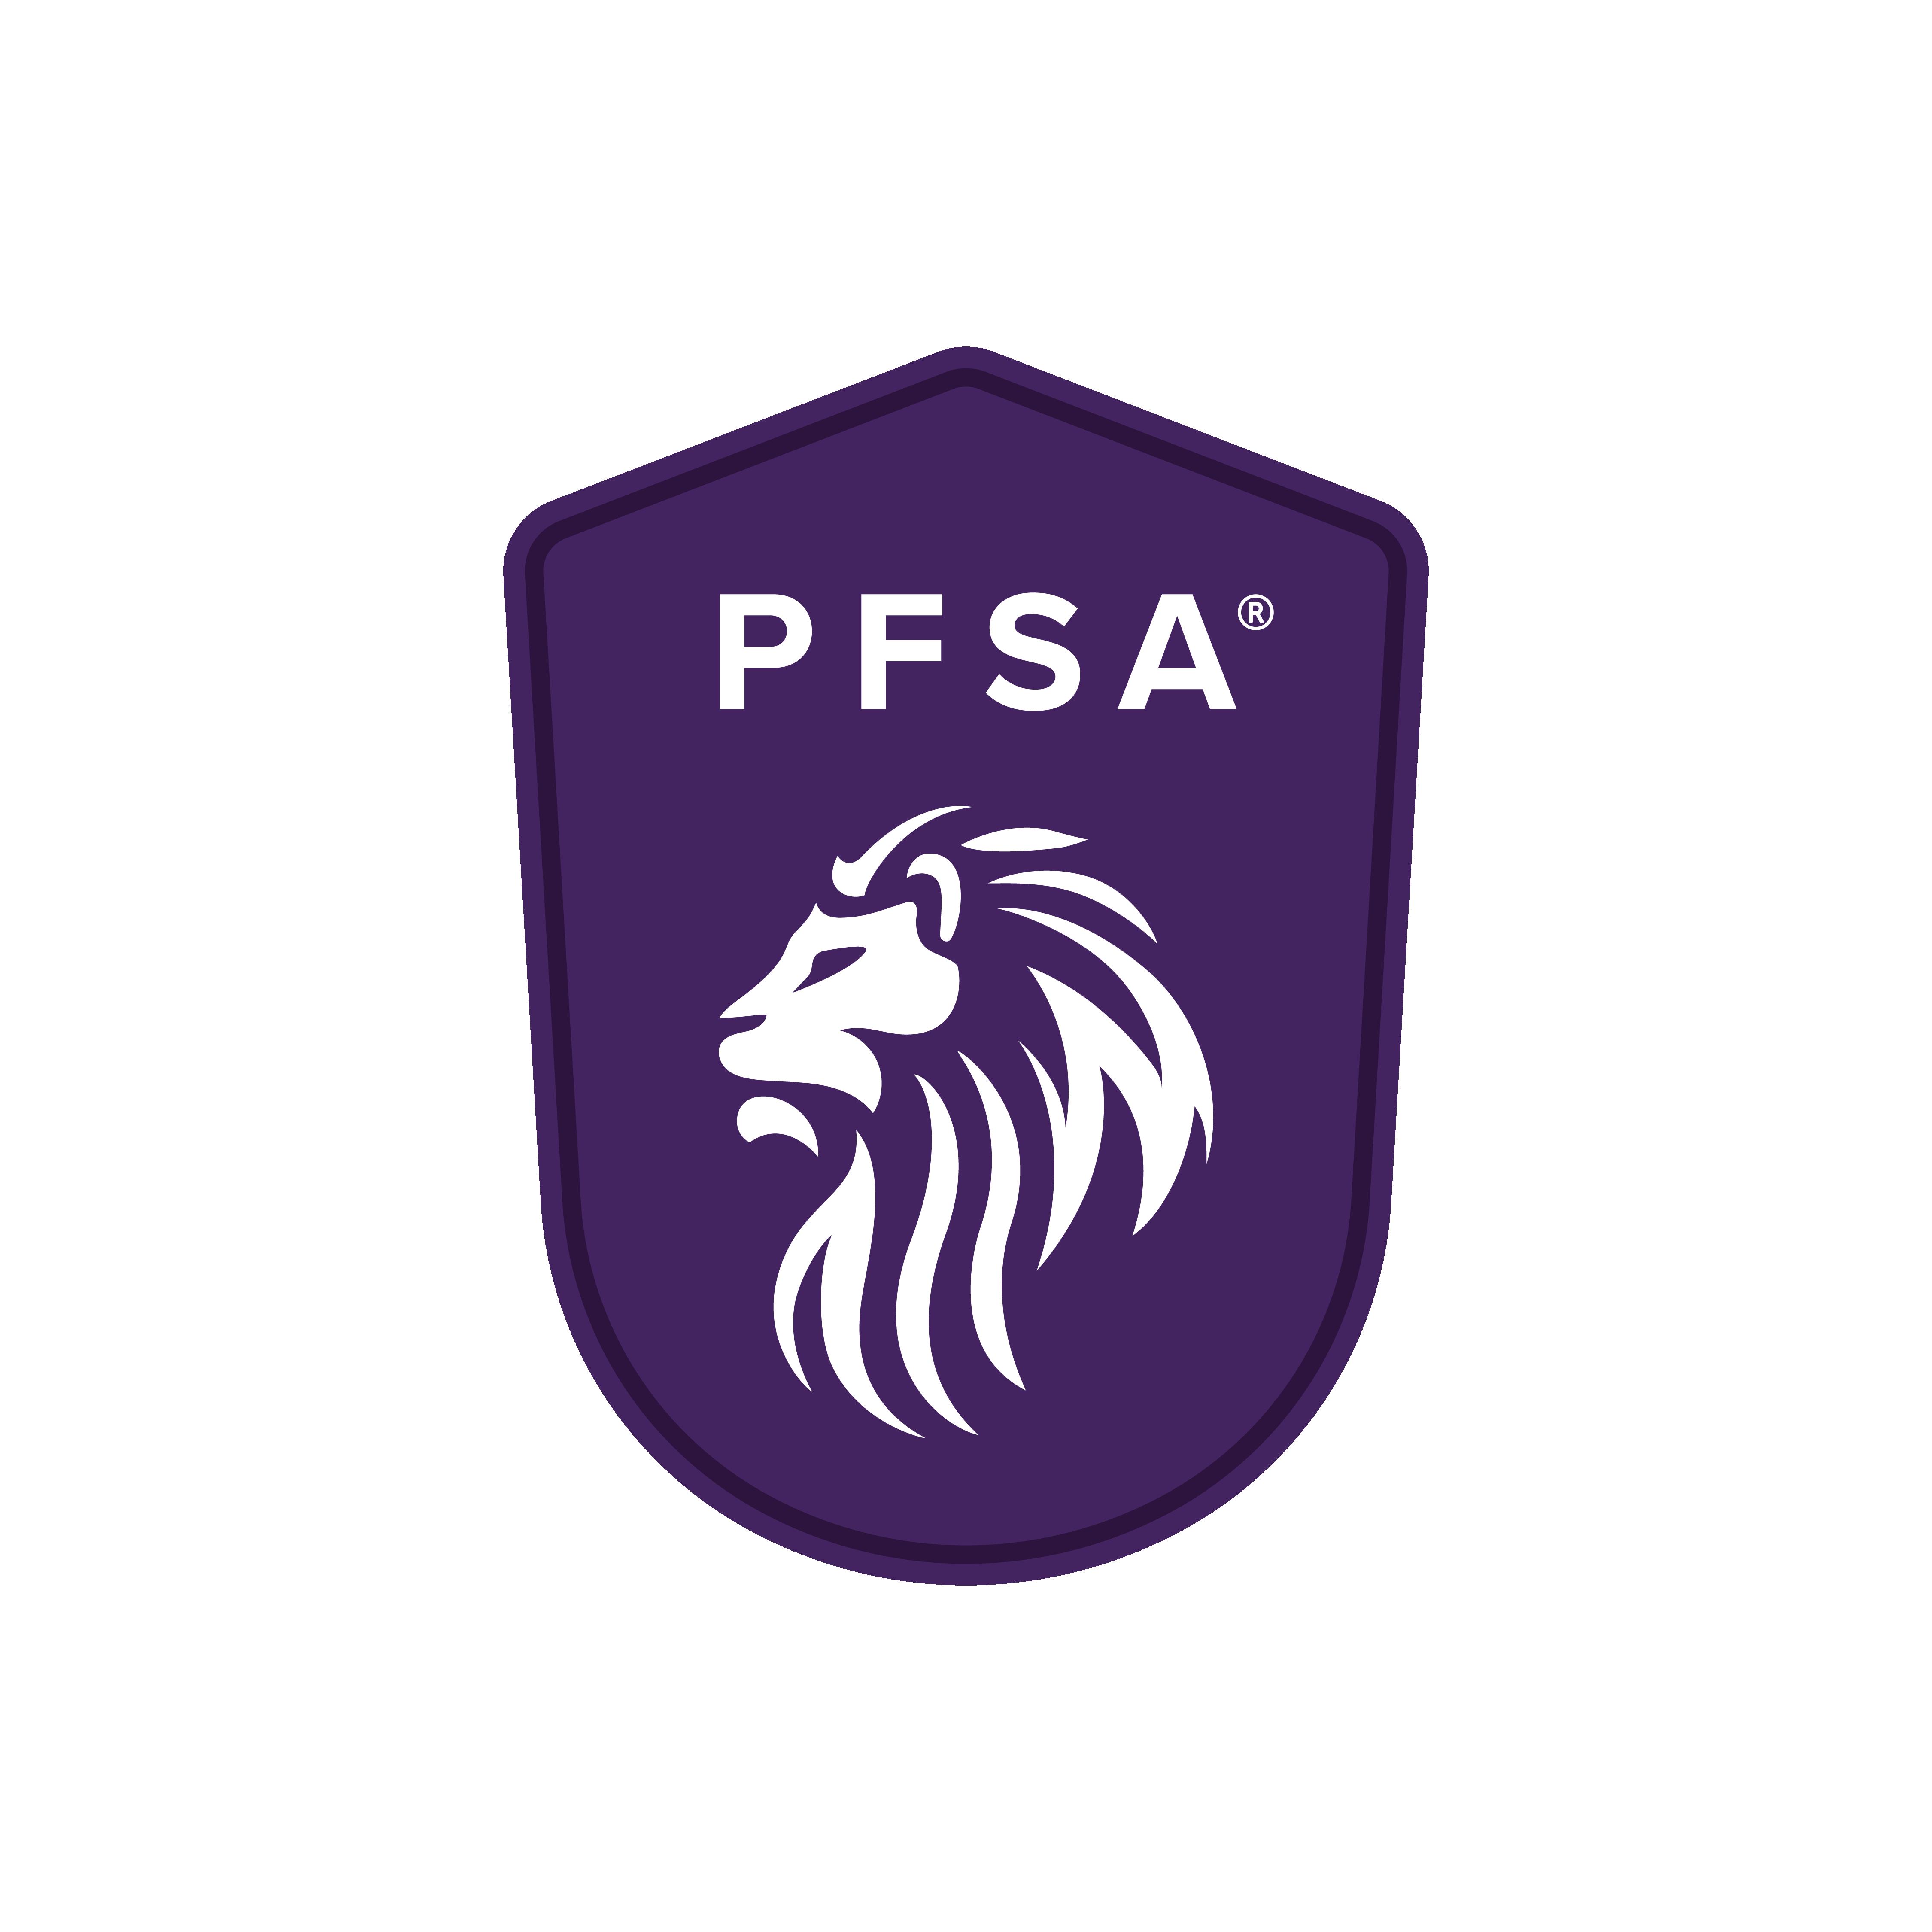 PFSA TM